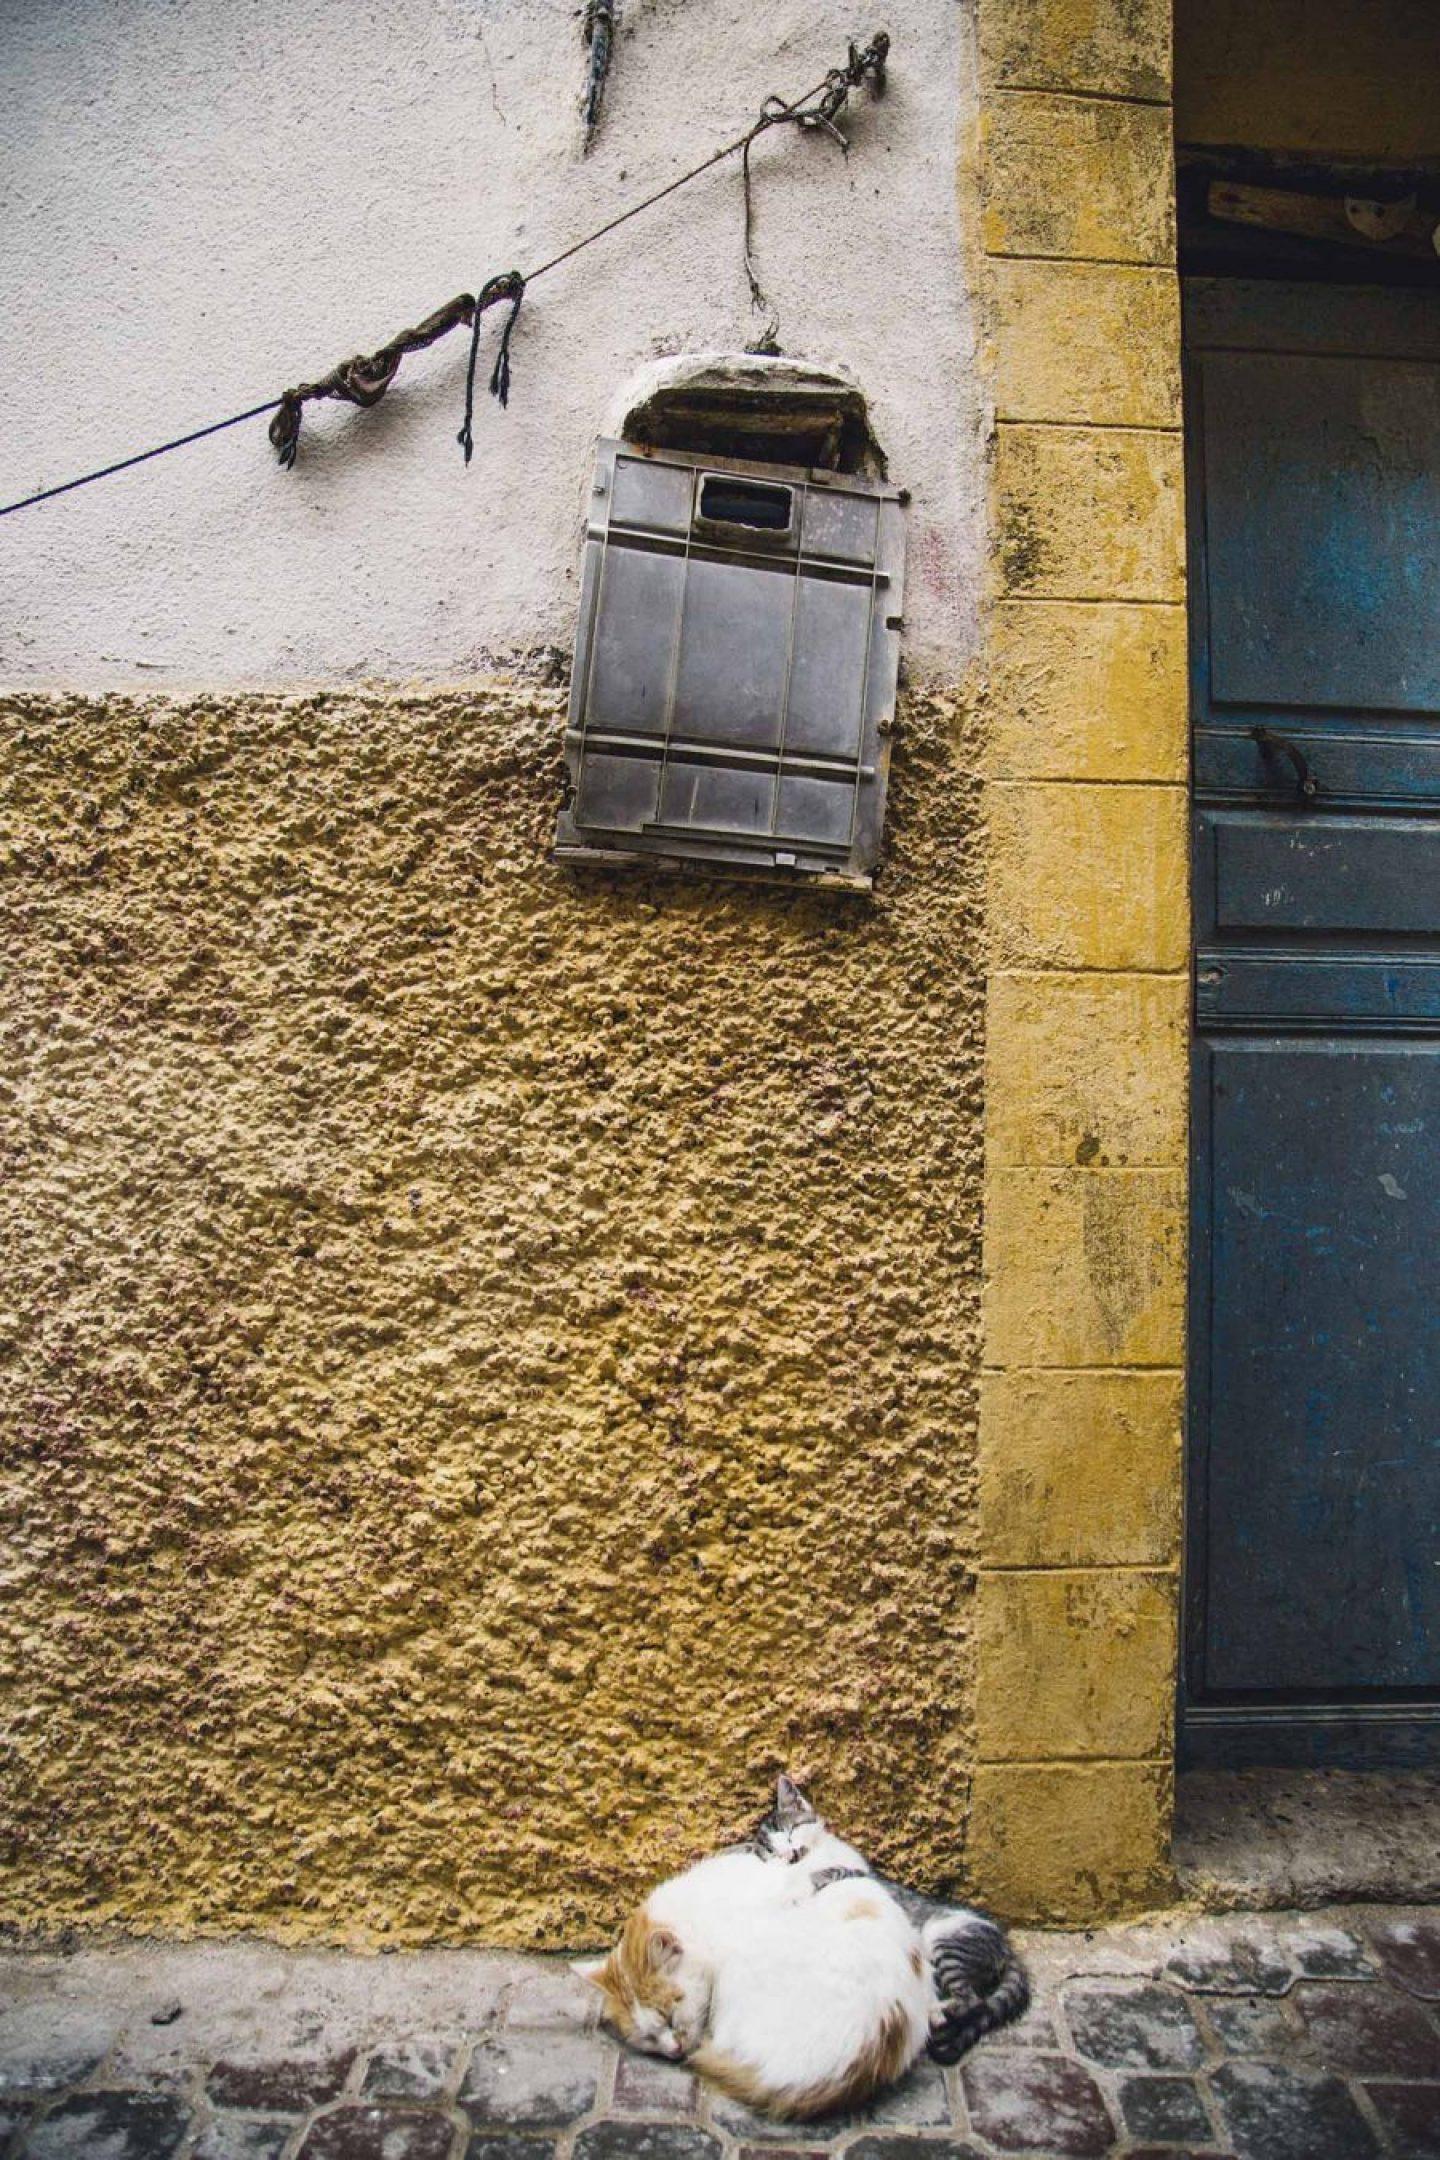 OTR_Marocco_NinaKleinrath_17